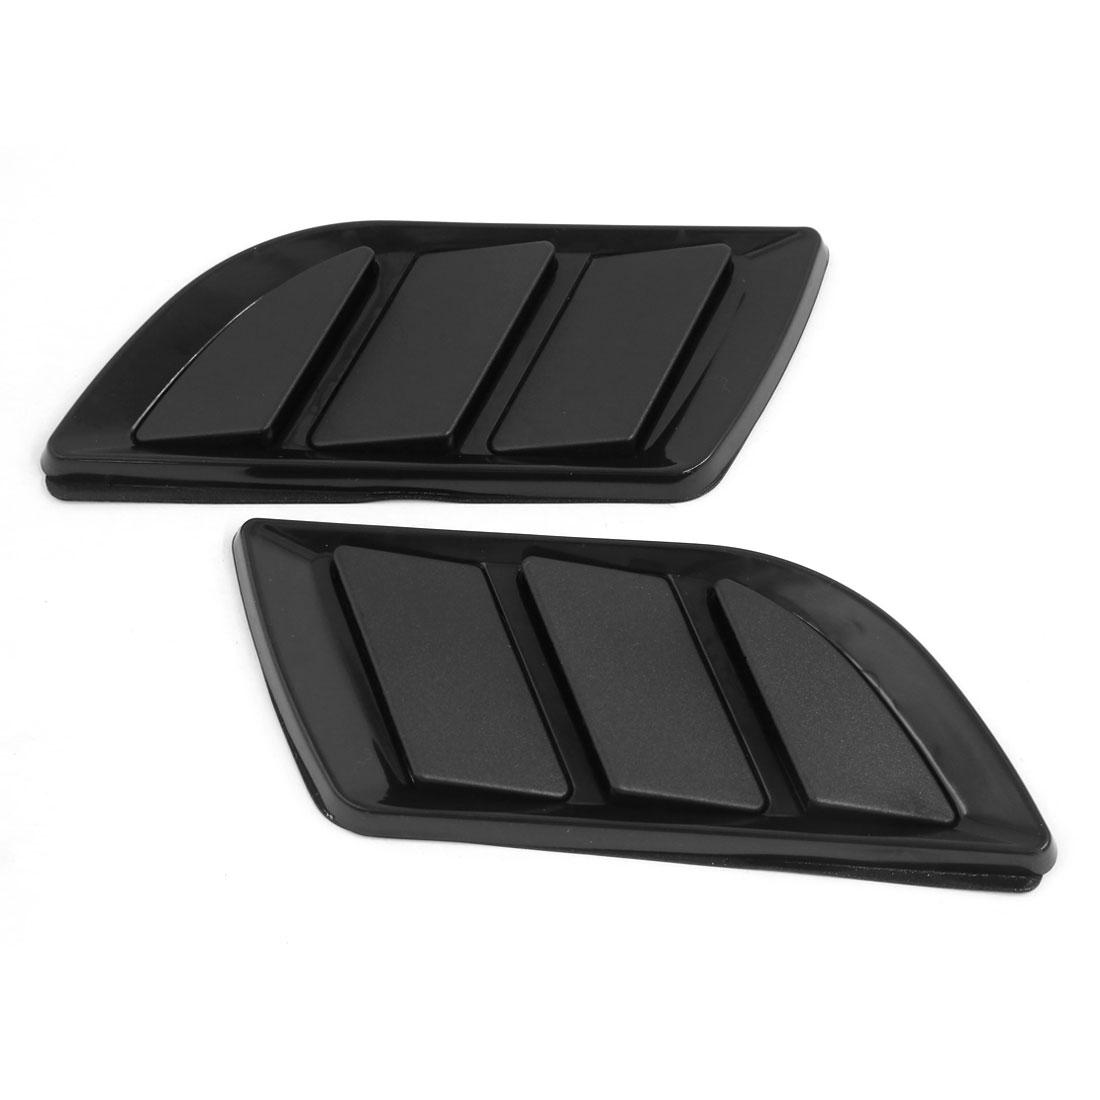 2Pcs Car Decorative Black Air Flow Intake Scoop Turbo Bonnet Vent Cover Hood